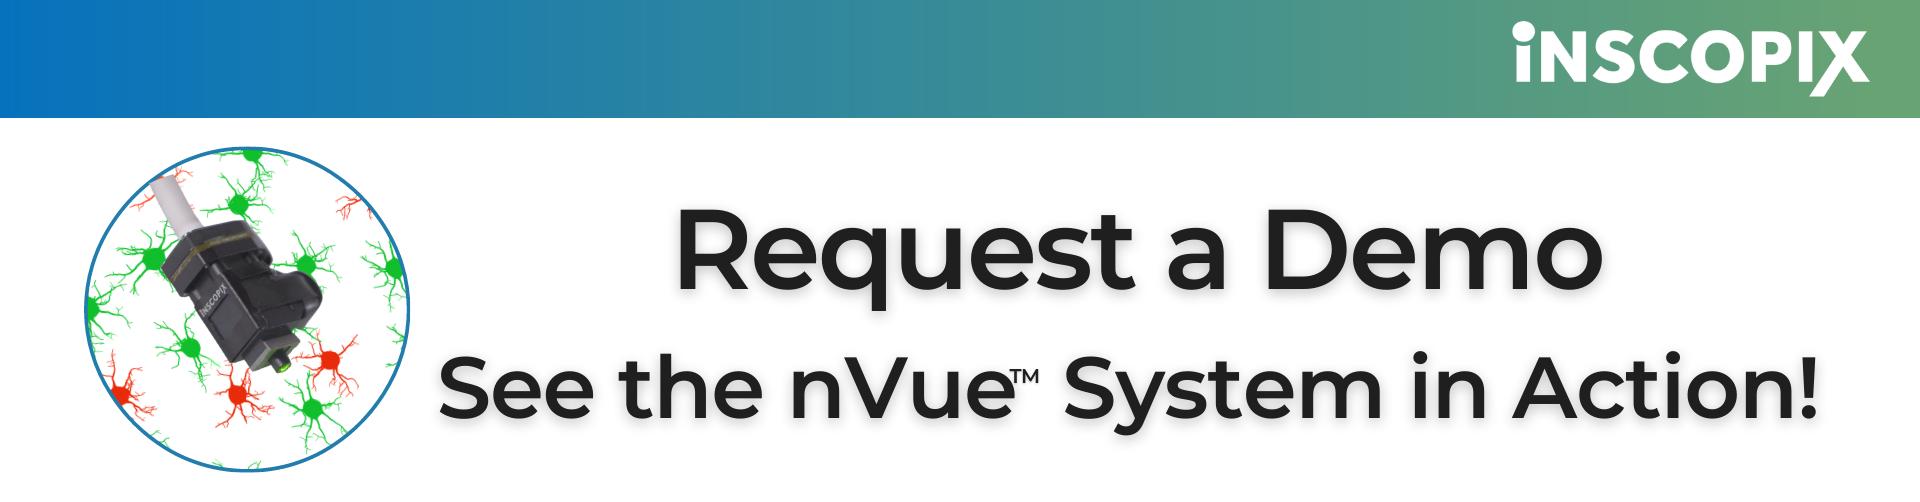 nVue Website_Request a Demo BANNER